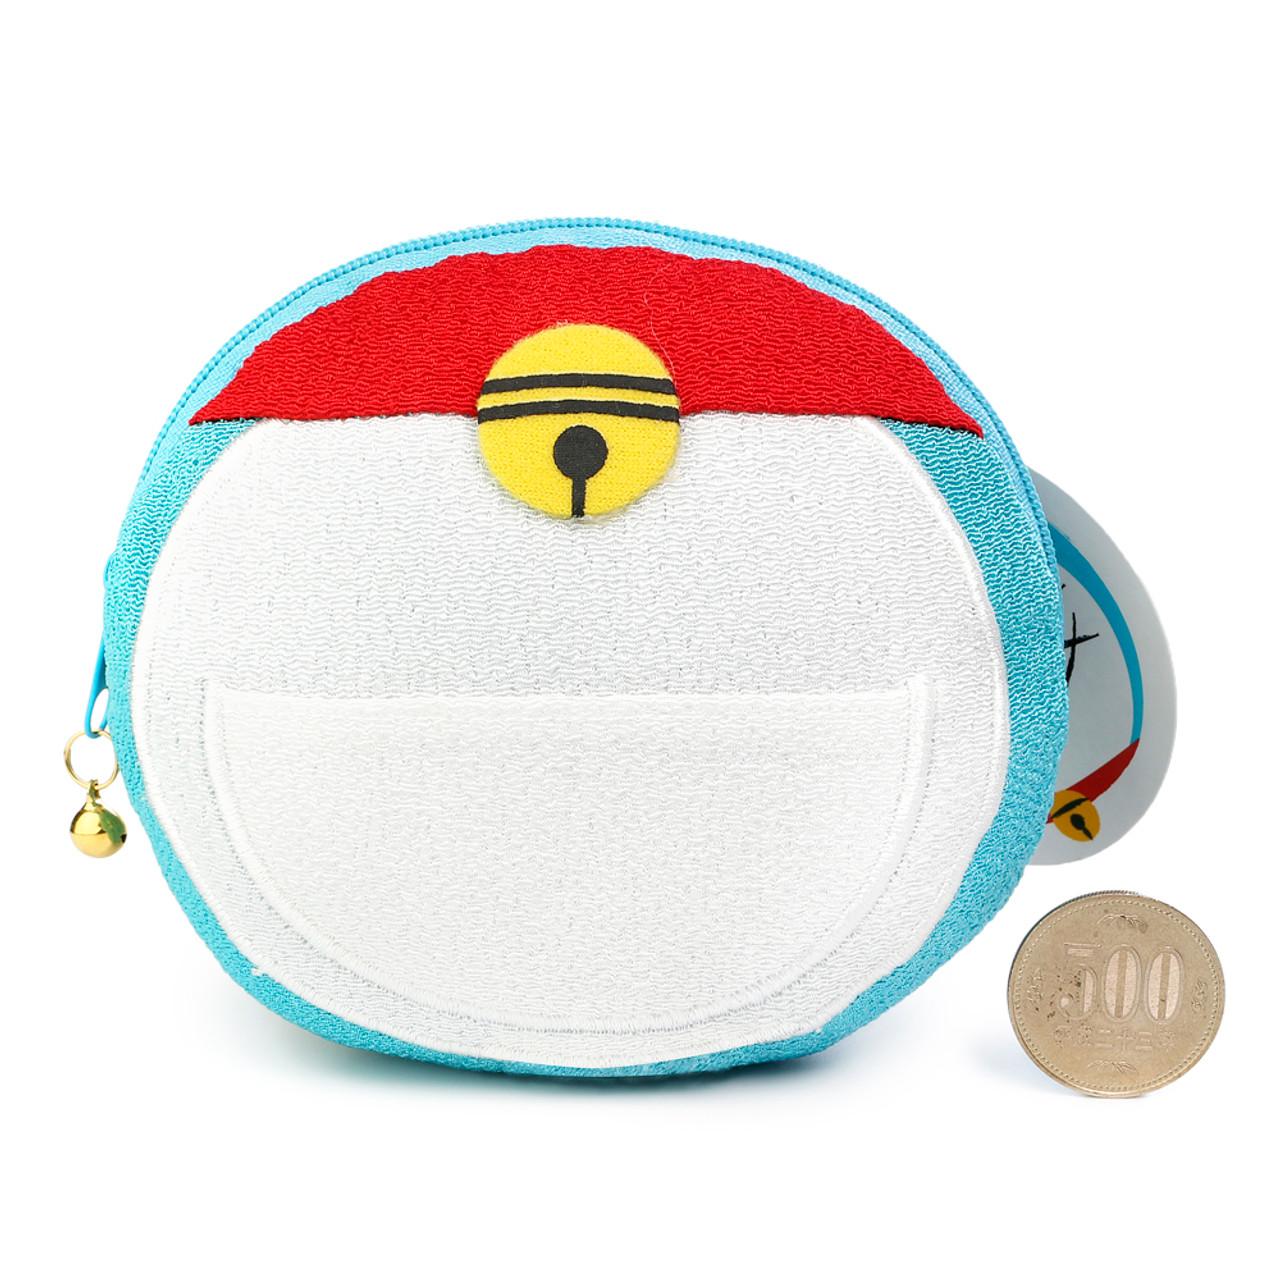 Doraemon Magic Stuffs Pocket Design Smart Card And Coins Wallet ( Front View & Proportion )